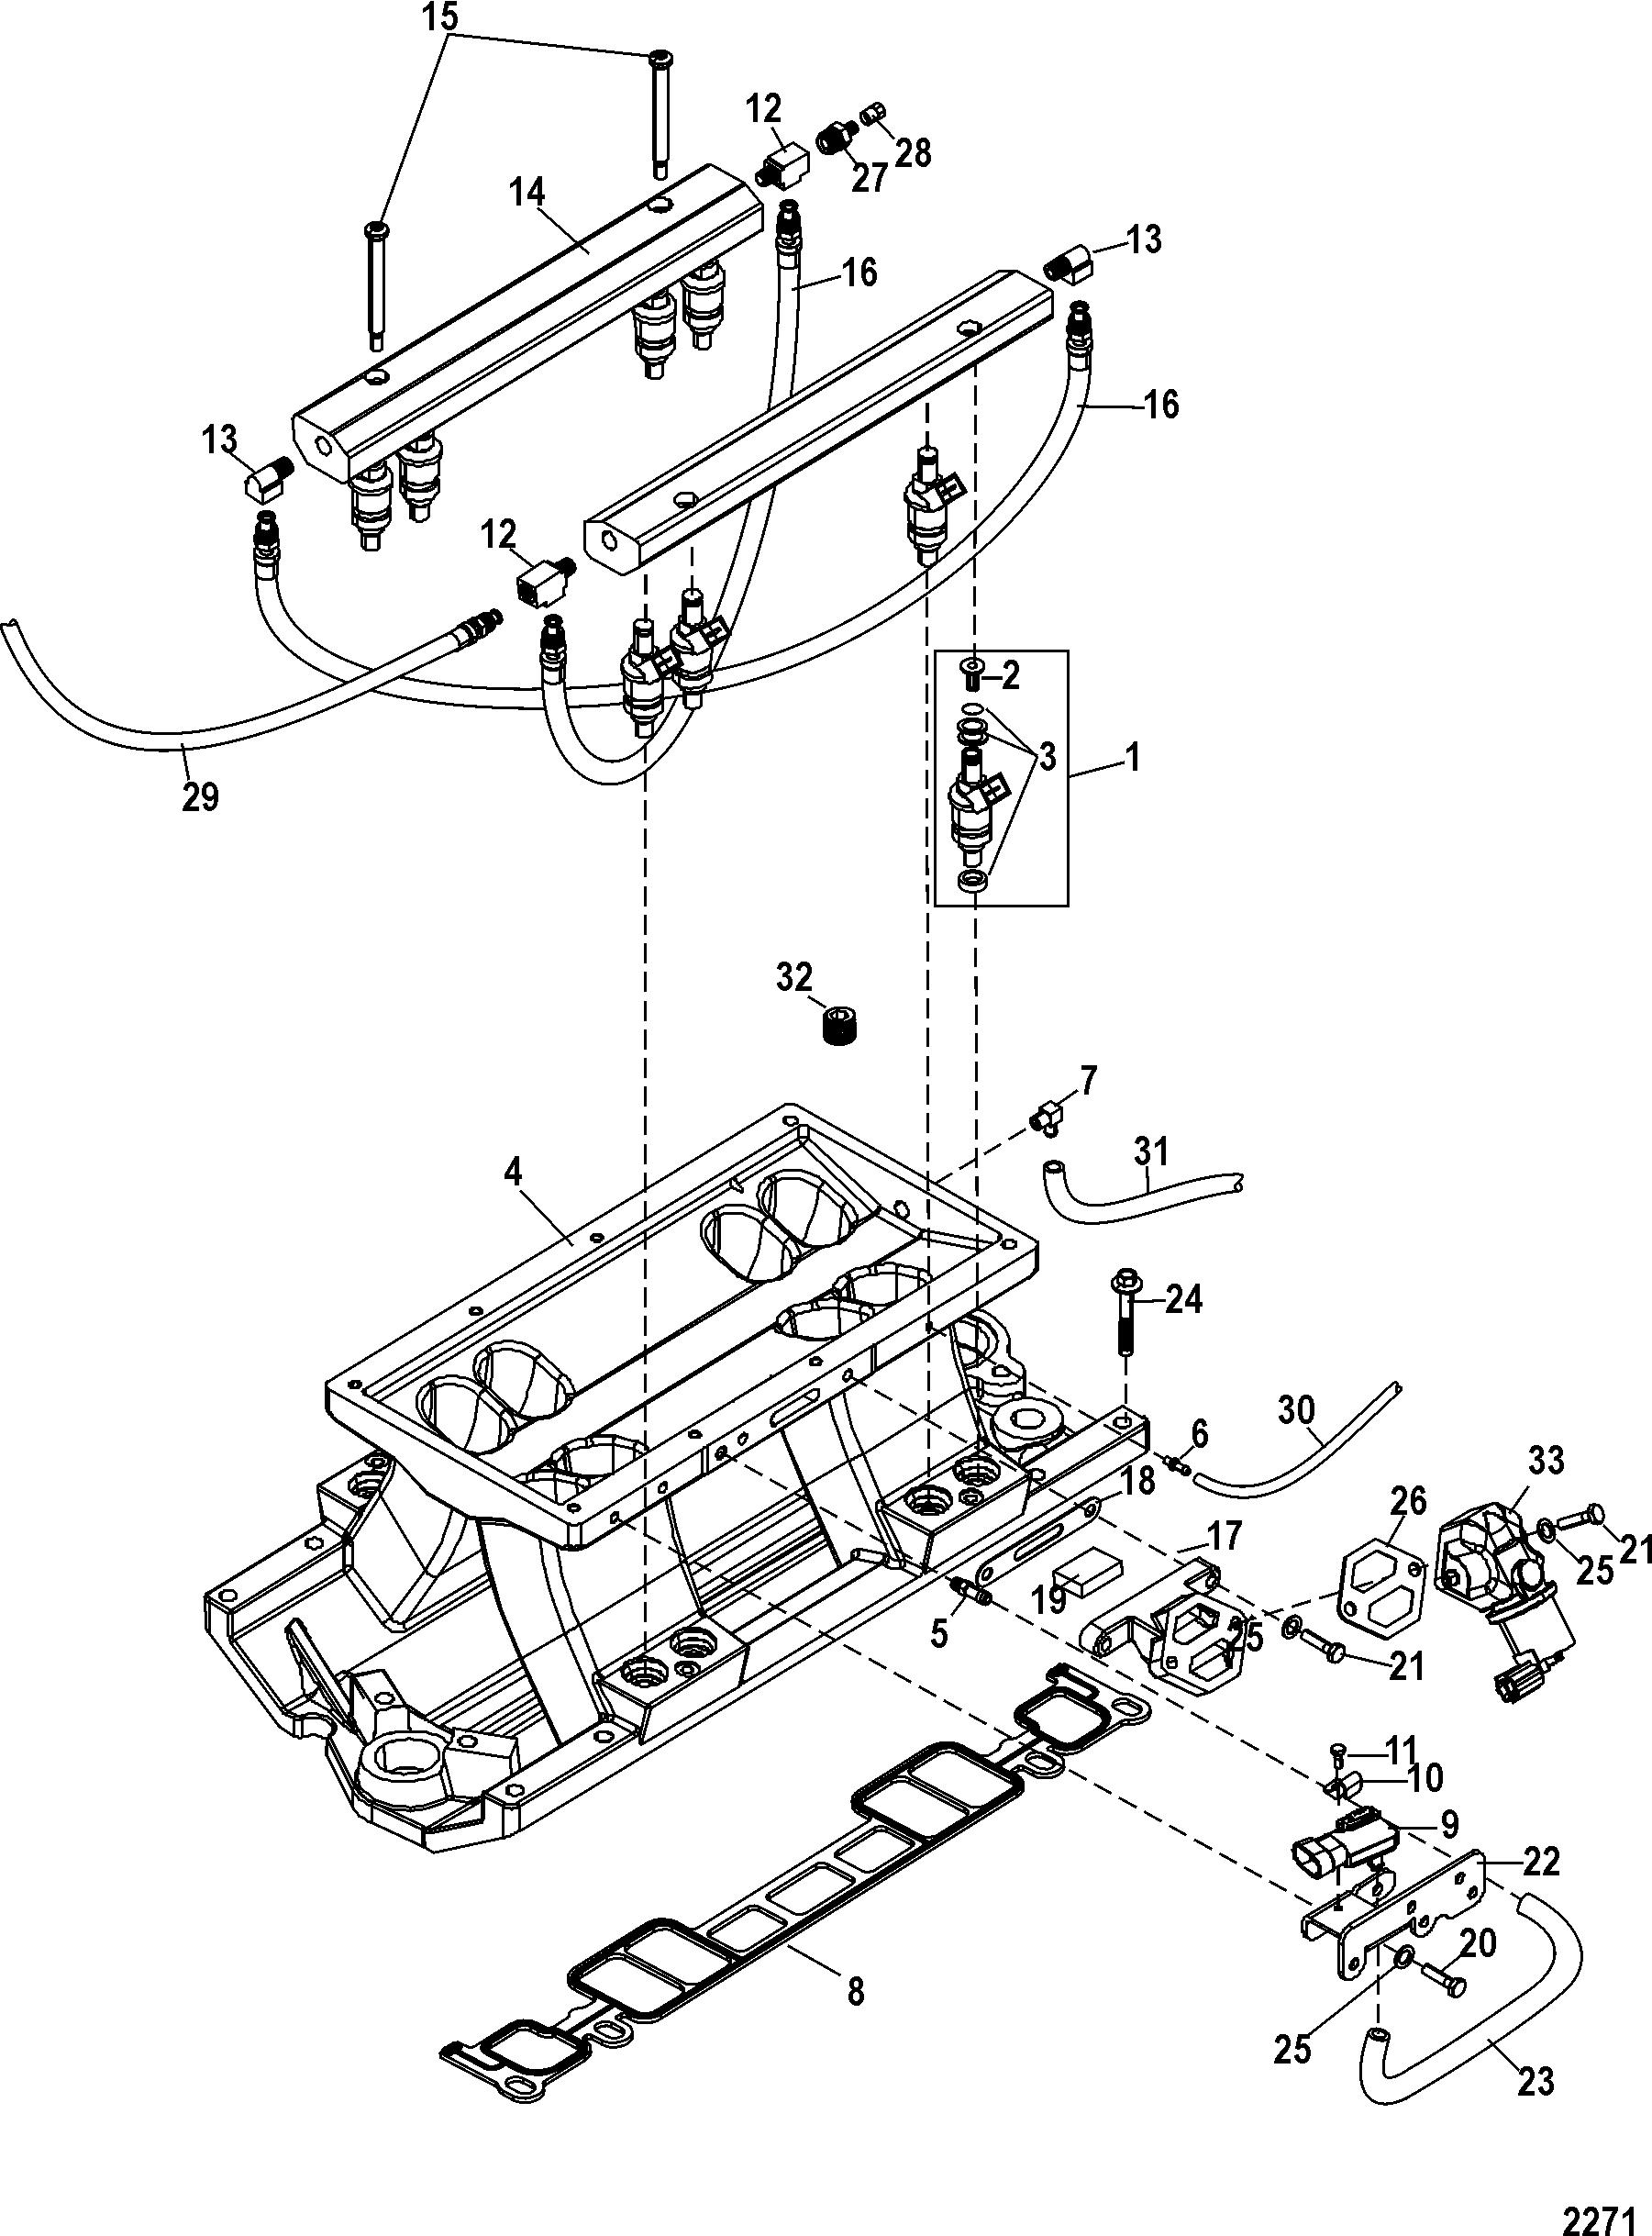 Mercruiser Scorpion 350 Engine Diagram Electrical Wiring Diagrams Mercury 0w698433 Up Intake 90 Gmc Schematic